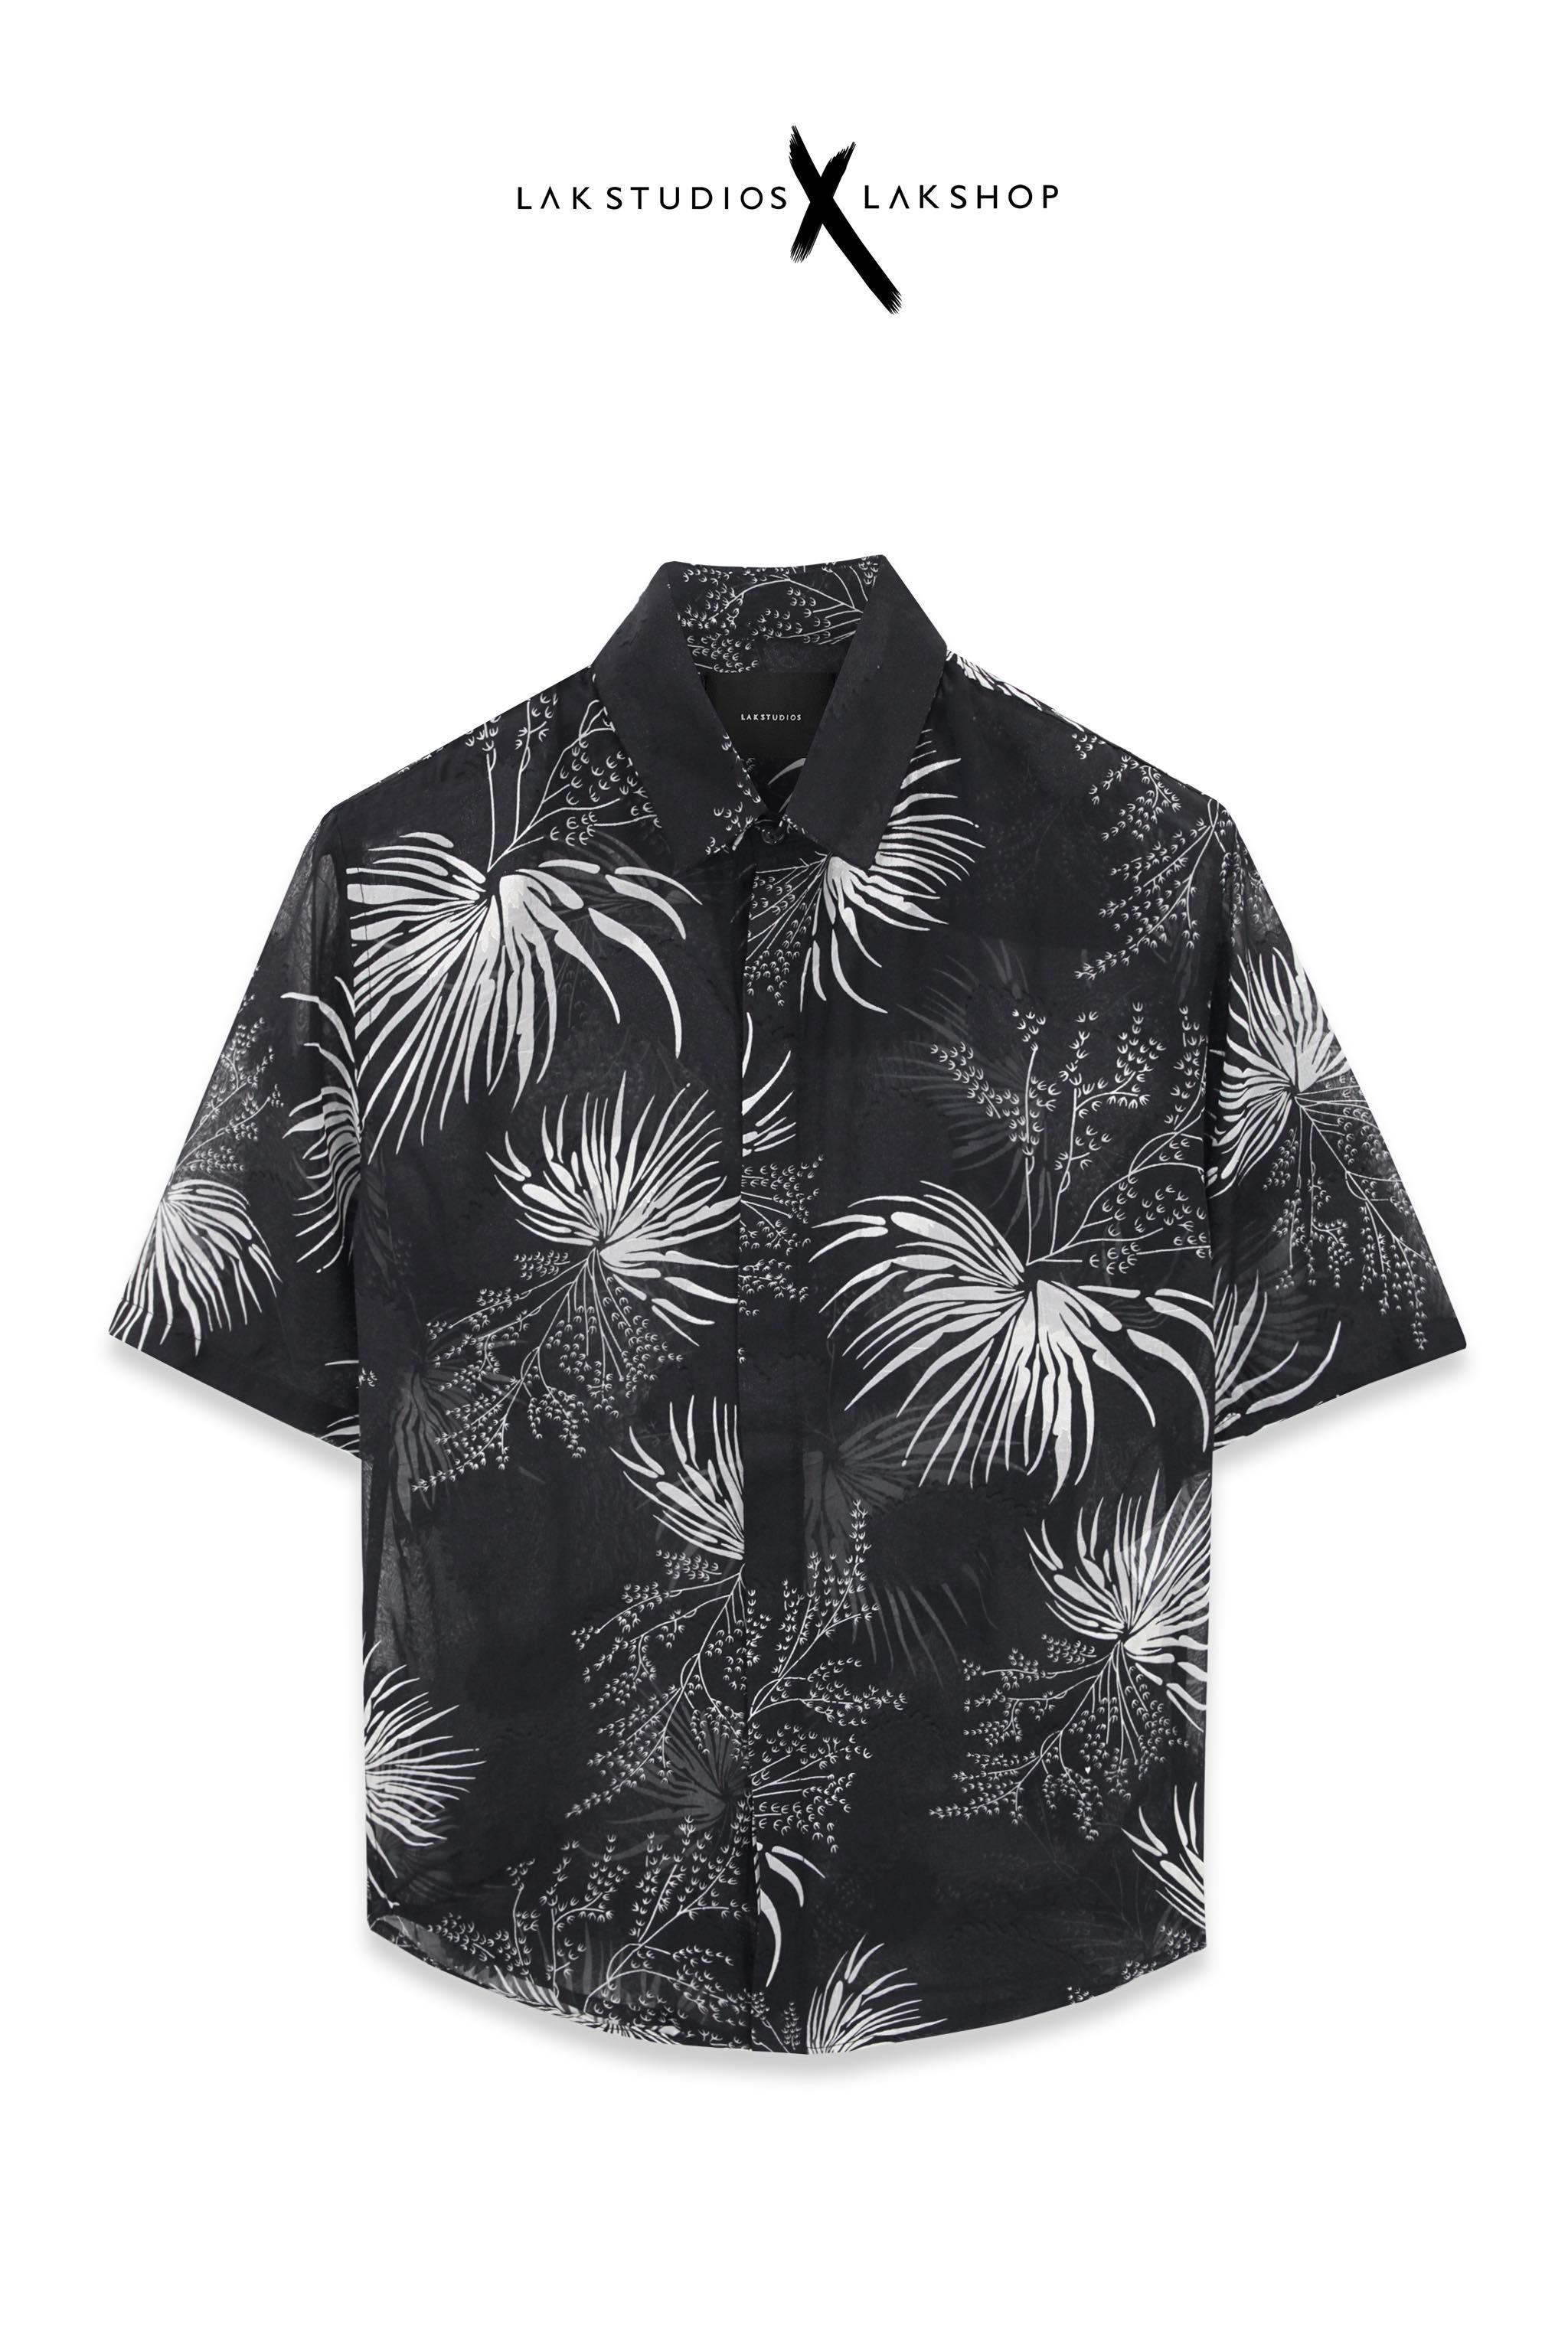 Nike Big Swoosh Faux Fur Black Jacket